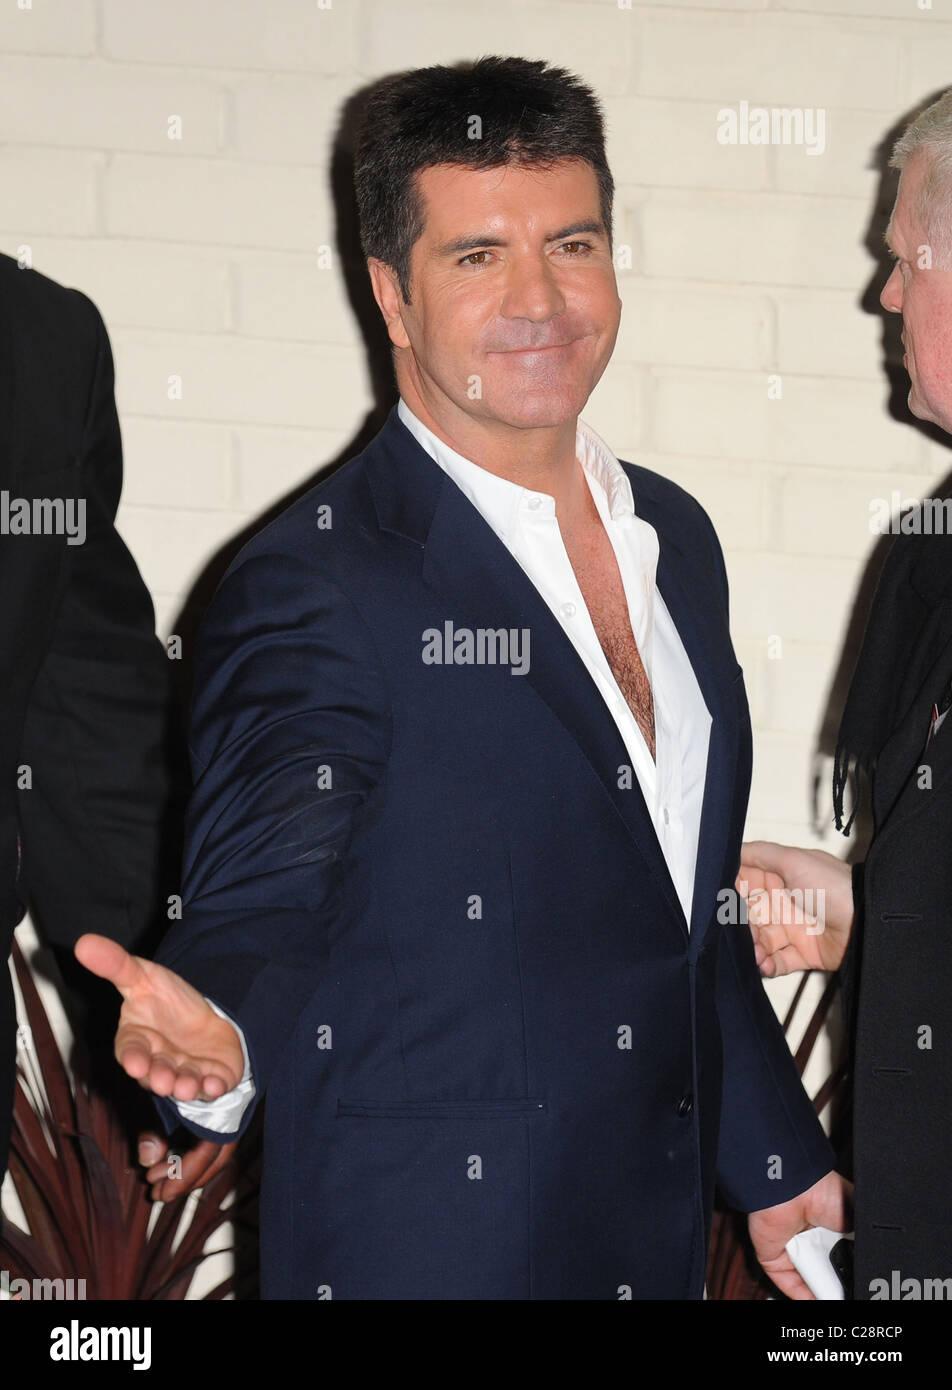 Simon cowell hairy chest